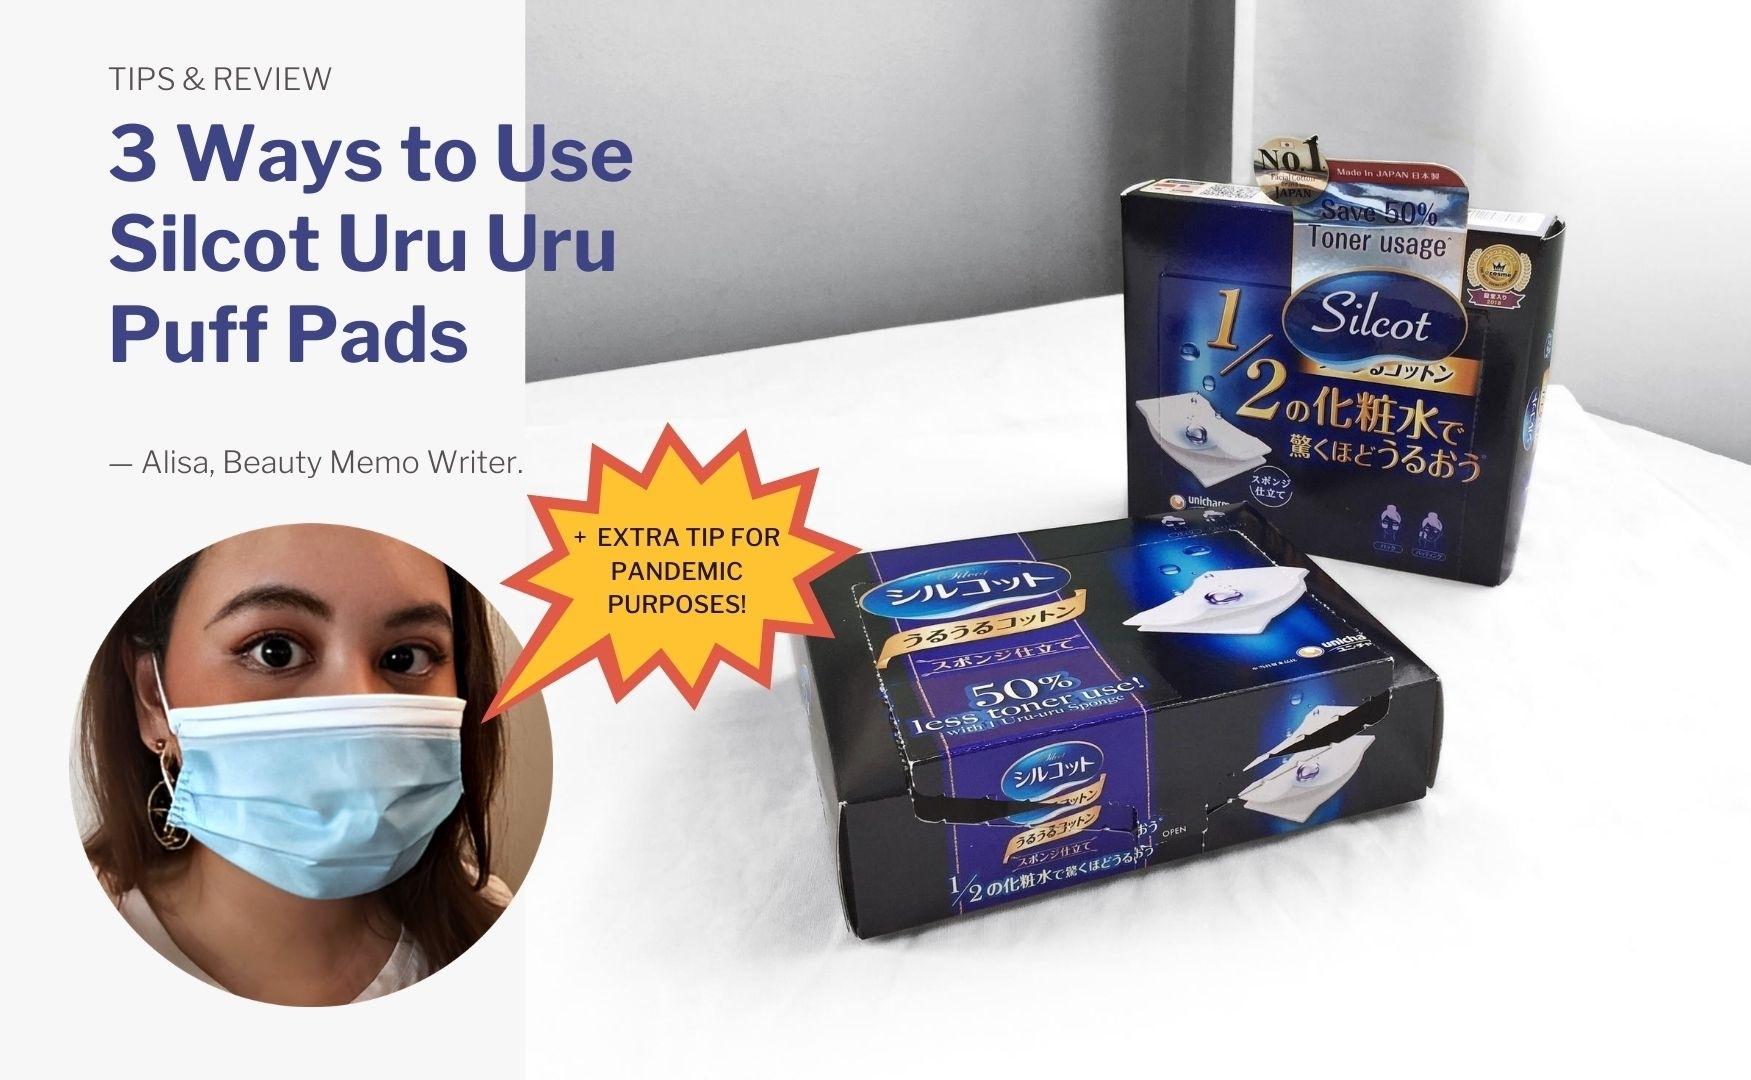 How To | 3 Ways to Use Silcot Uru Uru Puff Pads